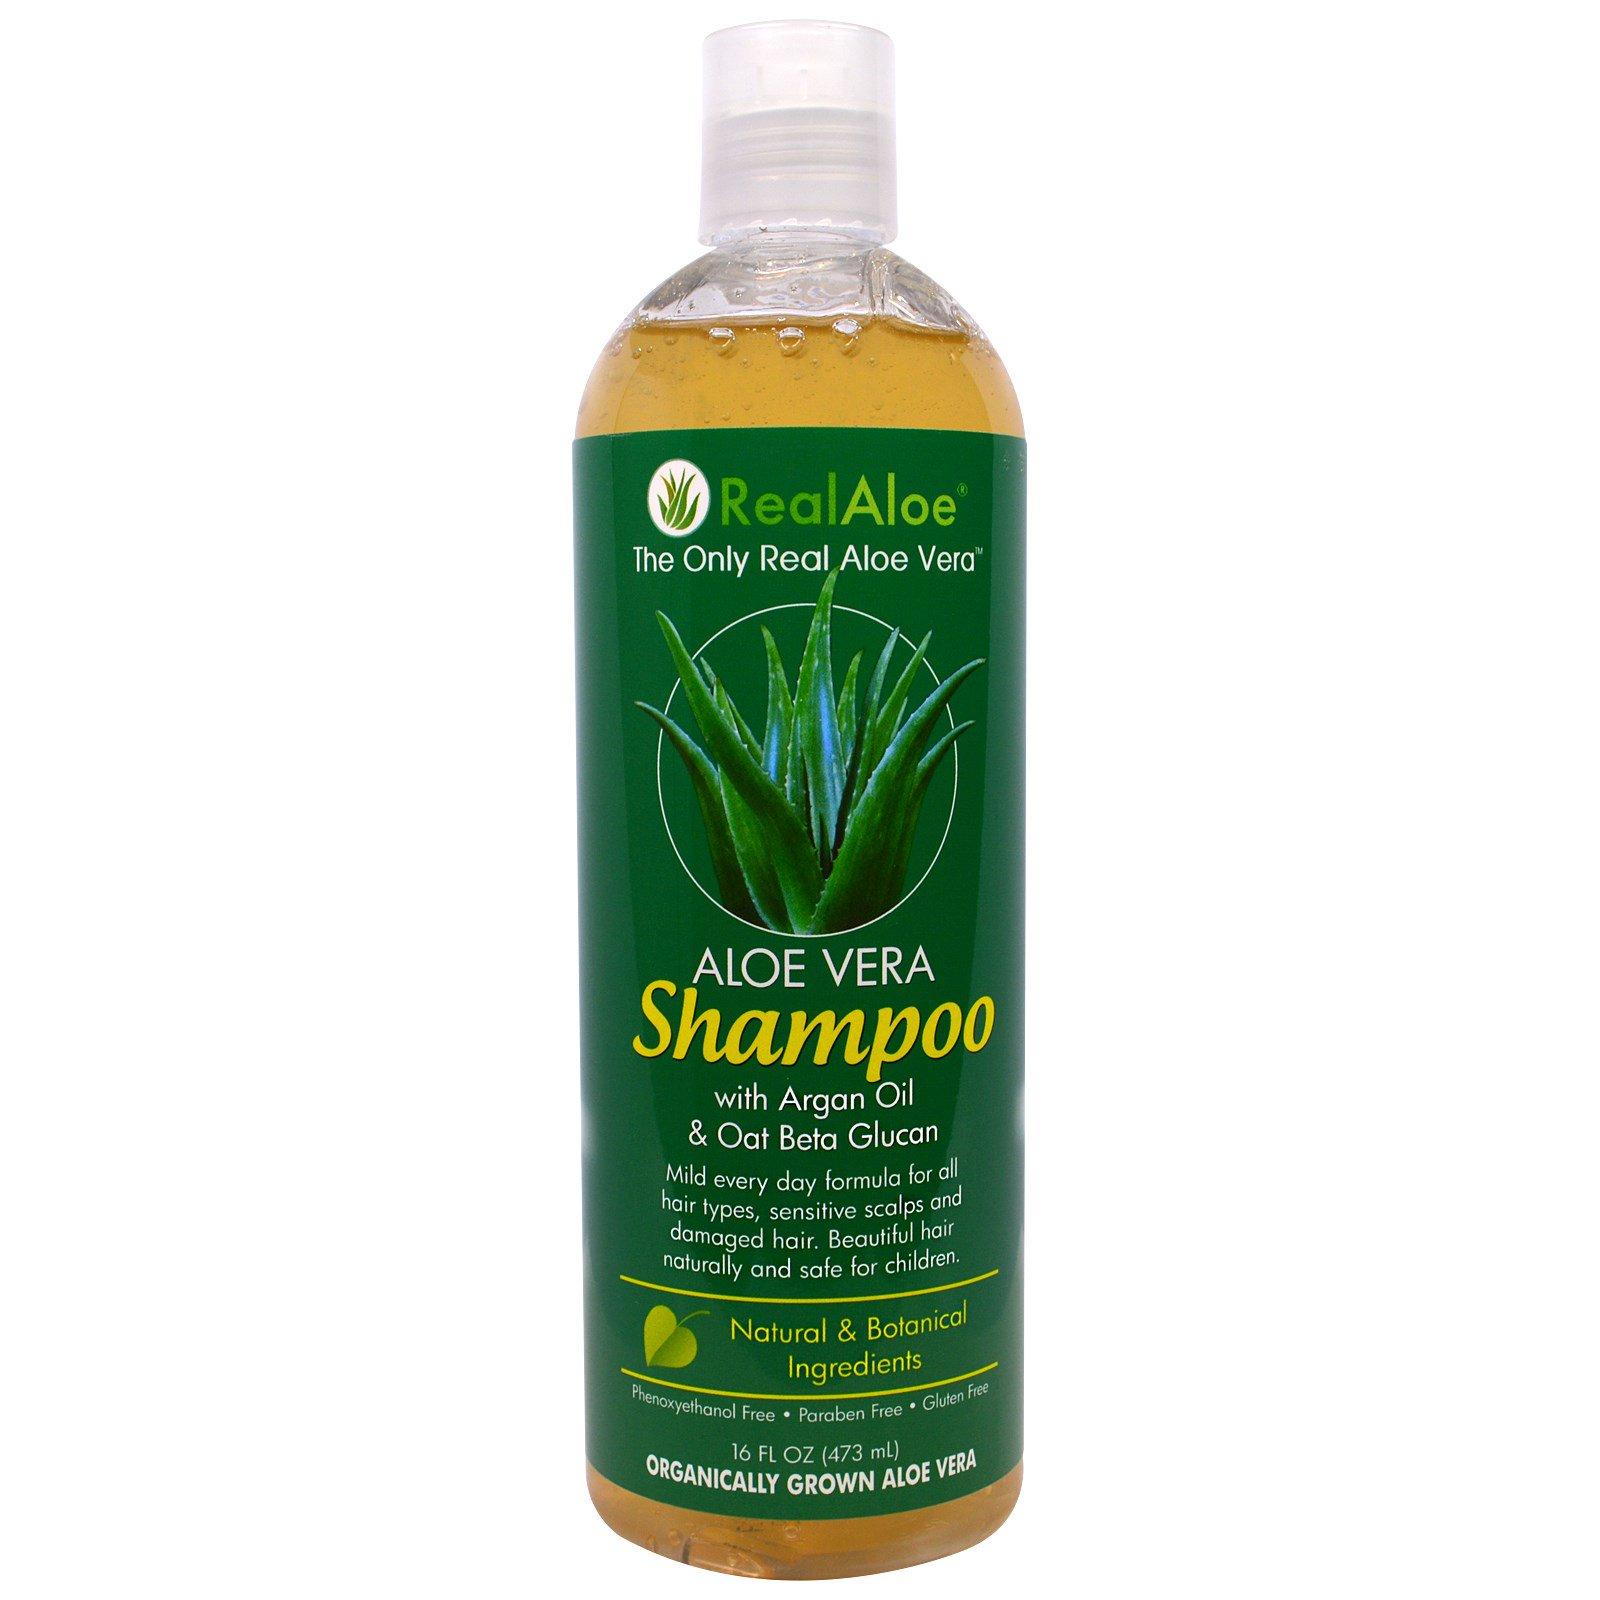 Real Aloe Inc., Aloe Vera Shampoo with Argan Oil & Oat Beta Glucan, 16 fl oz (473 mL) - iHerb.com